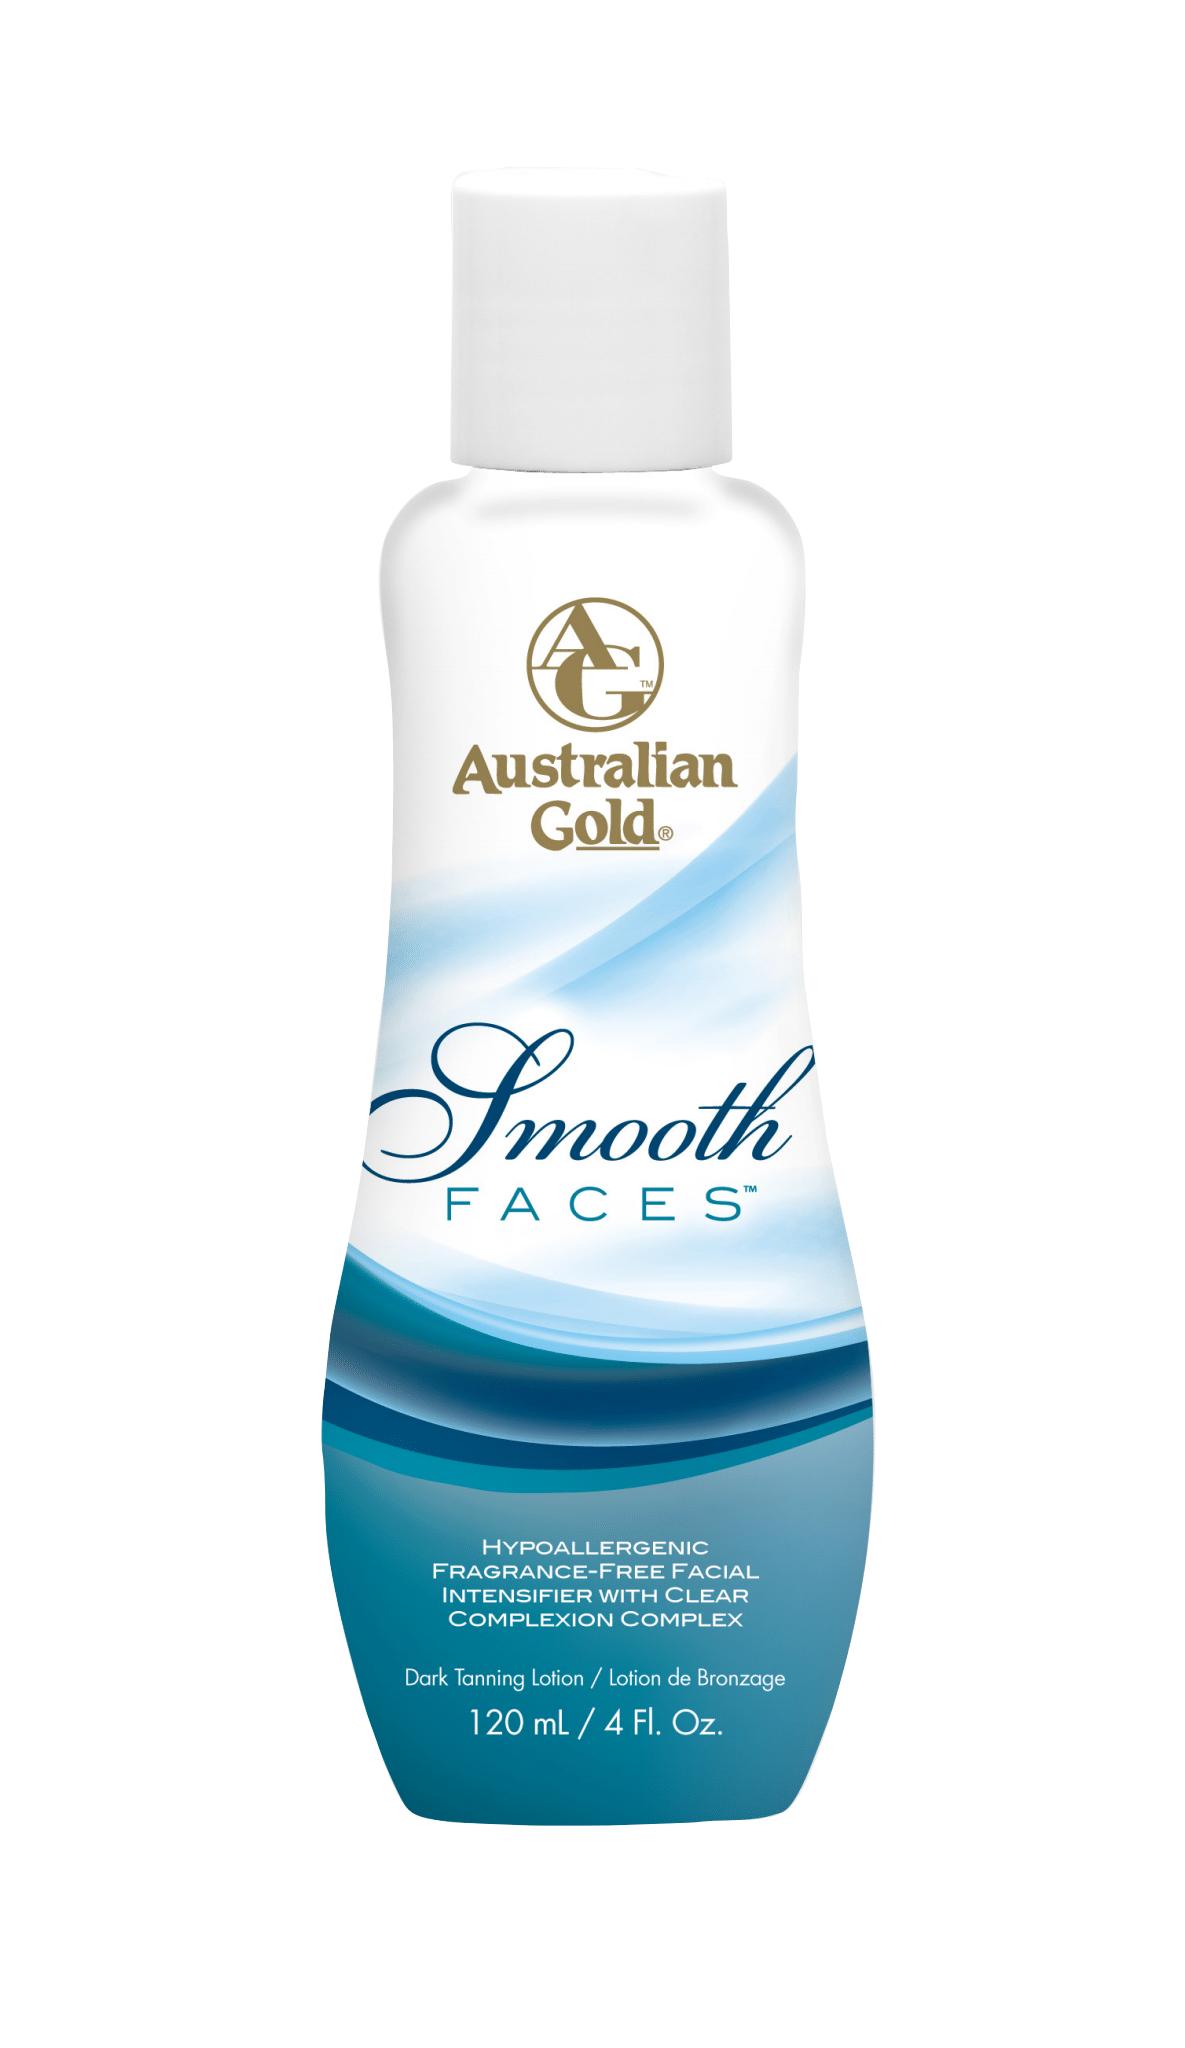 Australian Gold - Smooth Faces Dark Tanning Lotion 118 ml